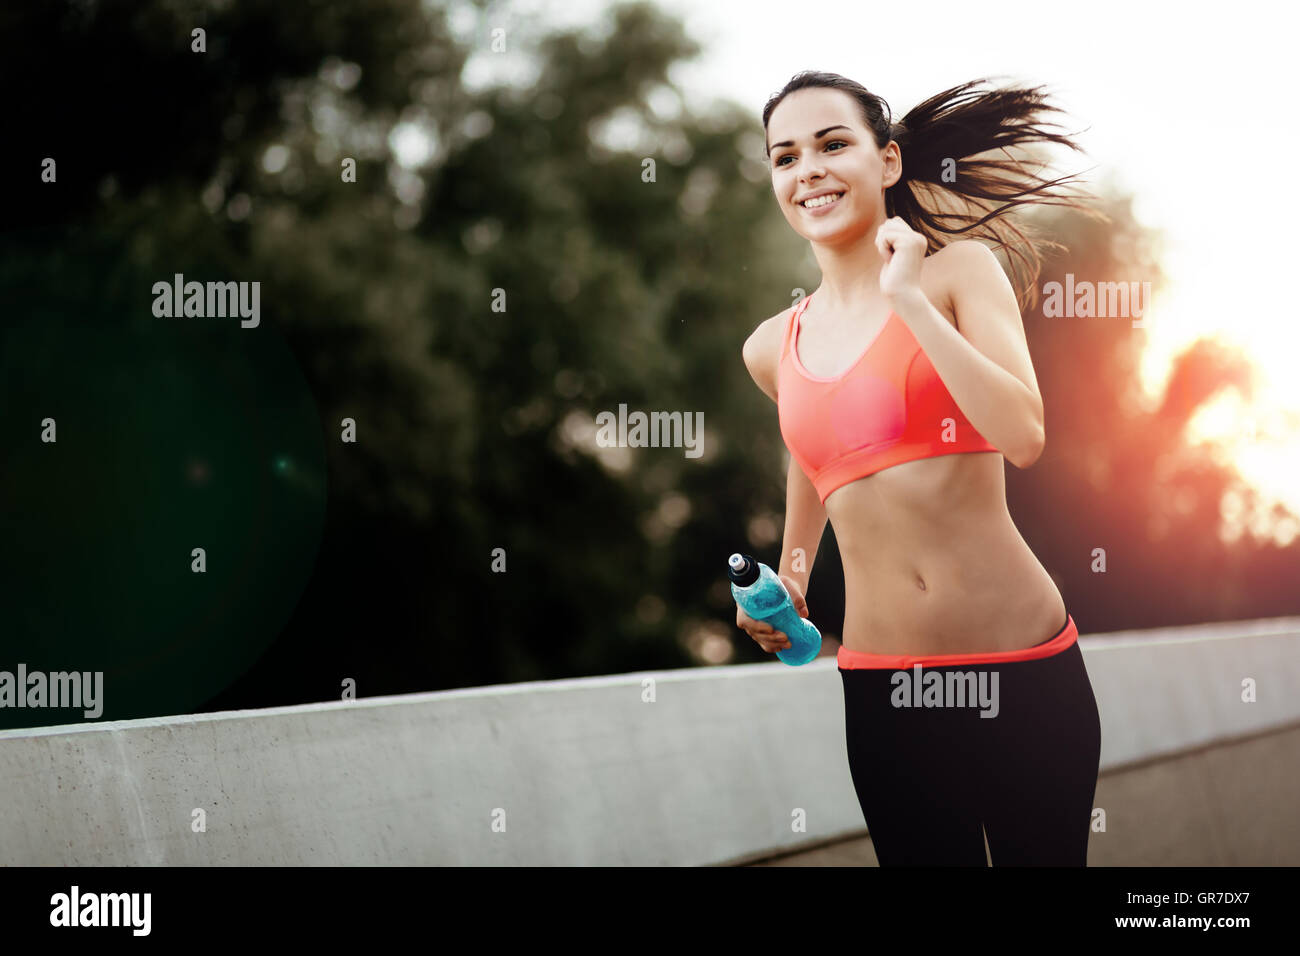 Feliz sonriente emparejador femenino deportivo Imagen De Stock